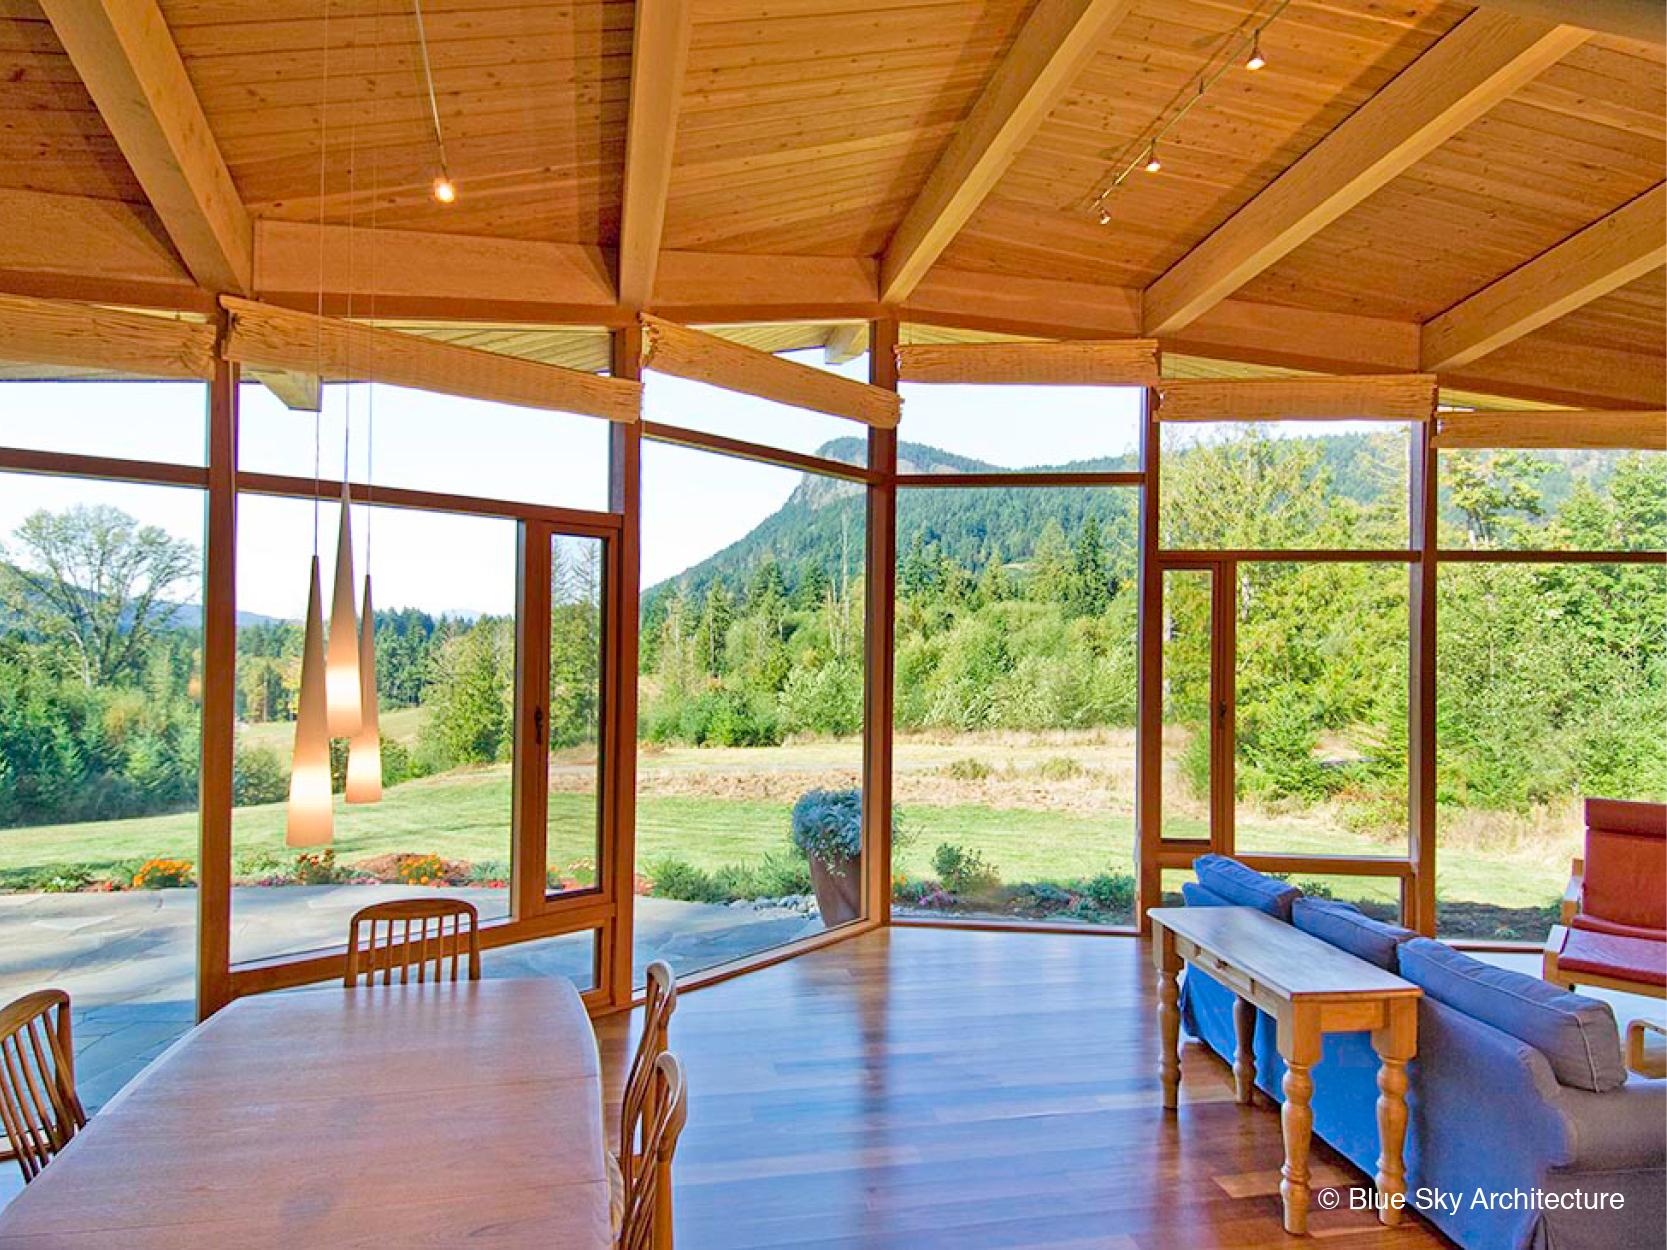 HollyFarm-house-interior-big-window-landscape-light.jpg